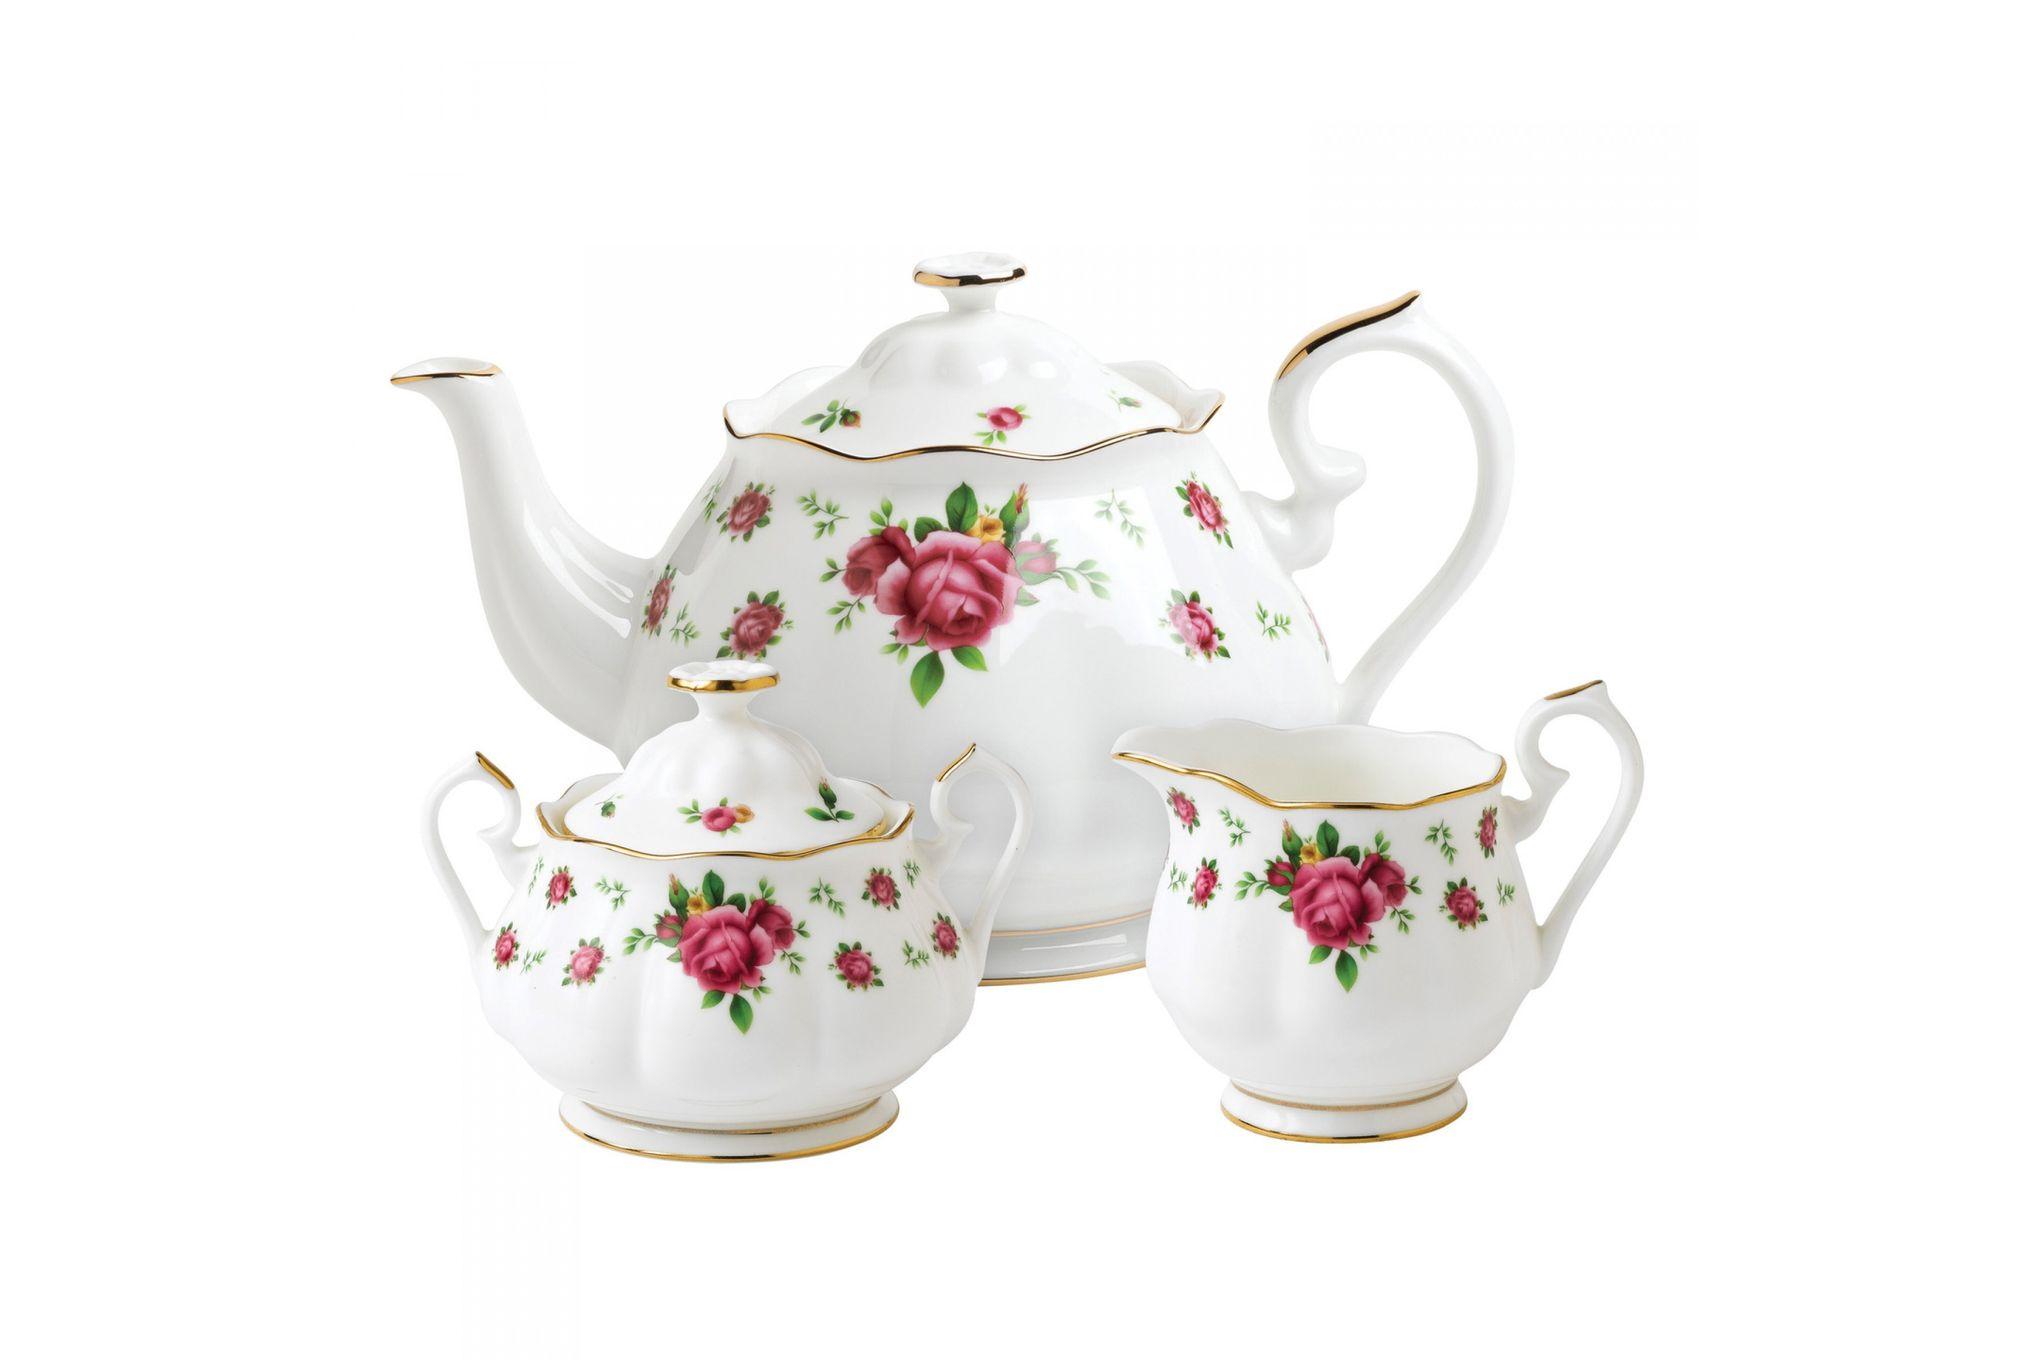 Royal Albert New Country Roses White 3 Piece Tea set Teapot, Sugar, Creamer thumb 1